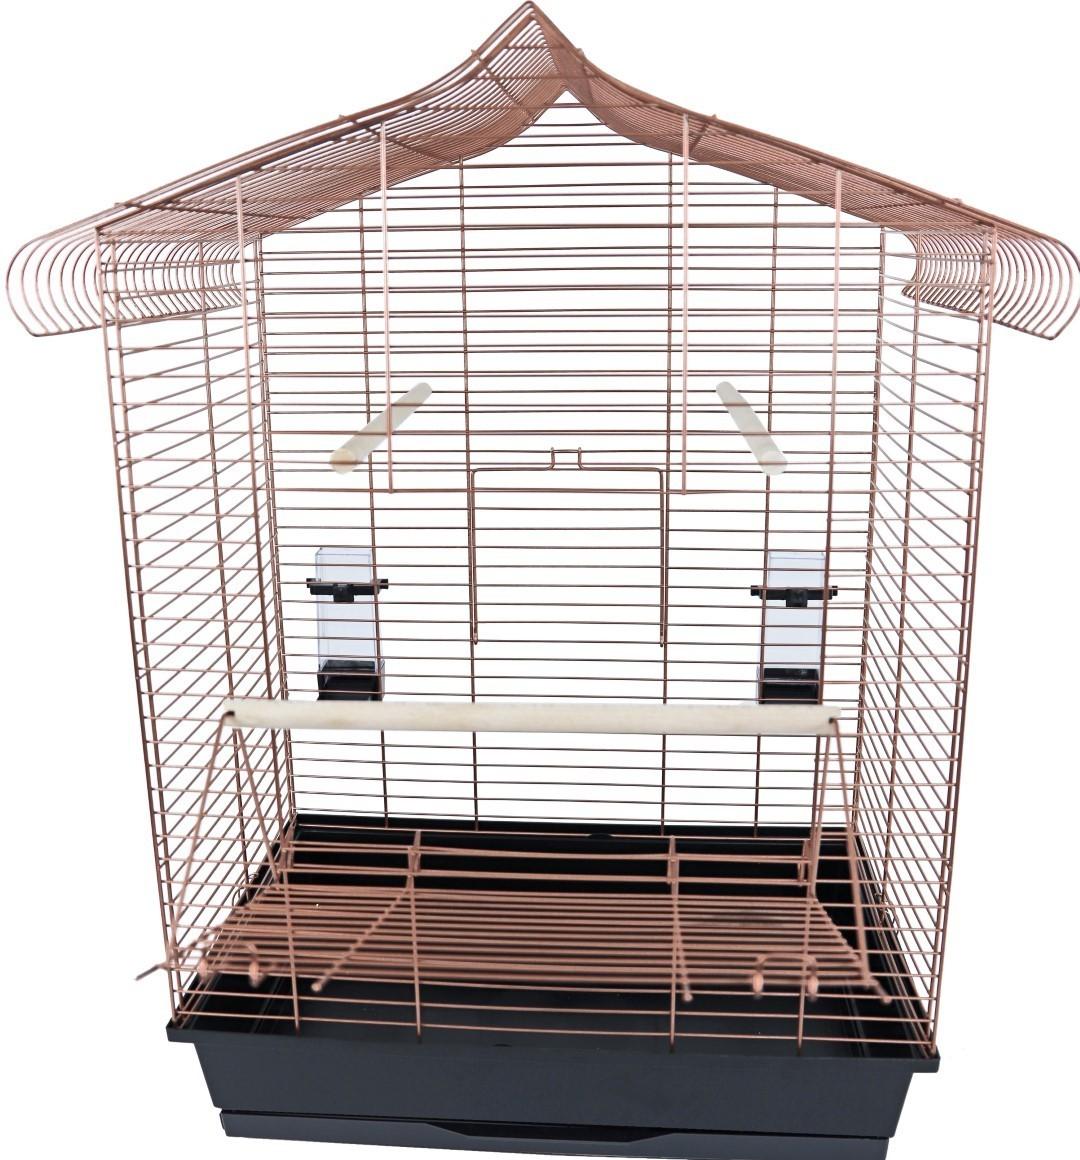 Interzoo vogelkooi Vega koper/zwart